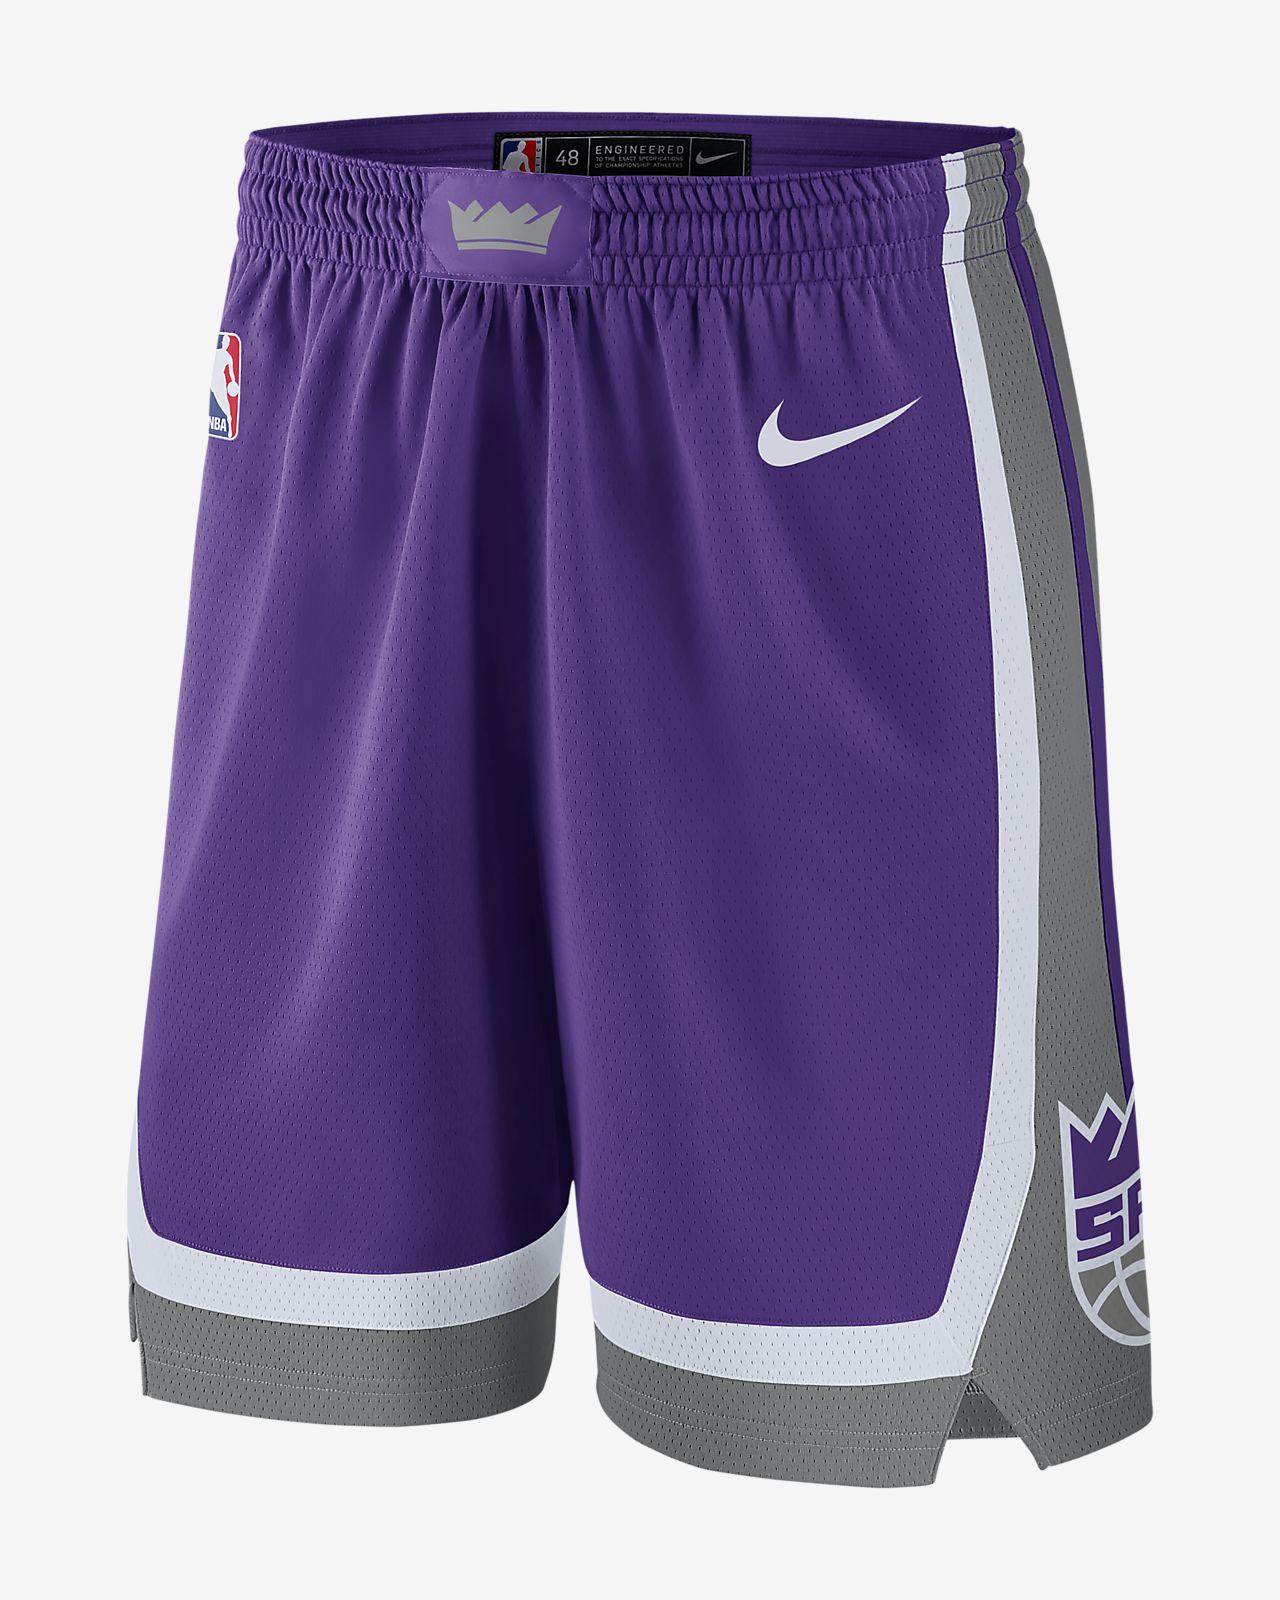 Sacramento Kings Icon Edition Swingman Nike NBA-herenshorts